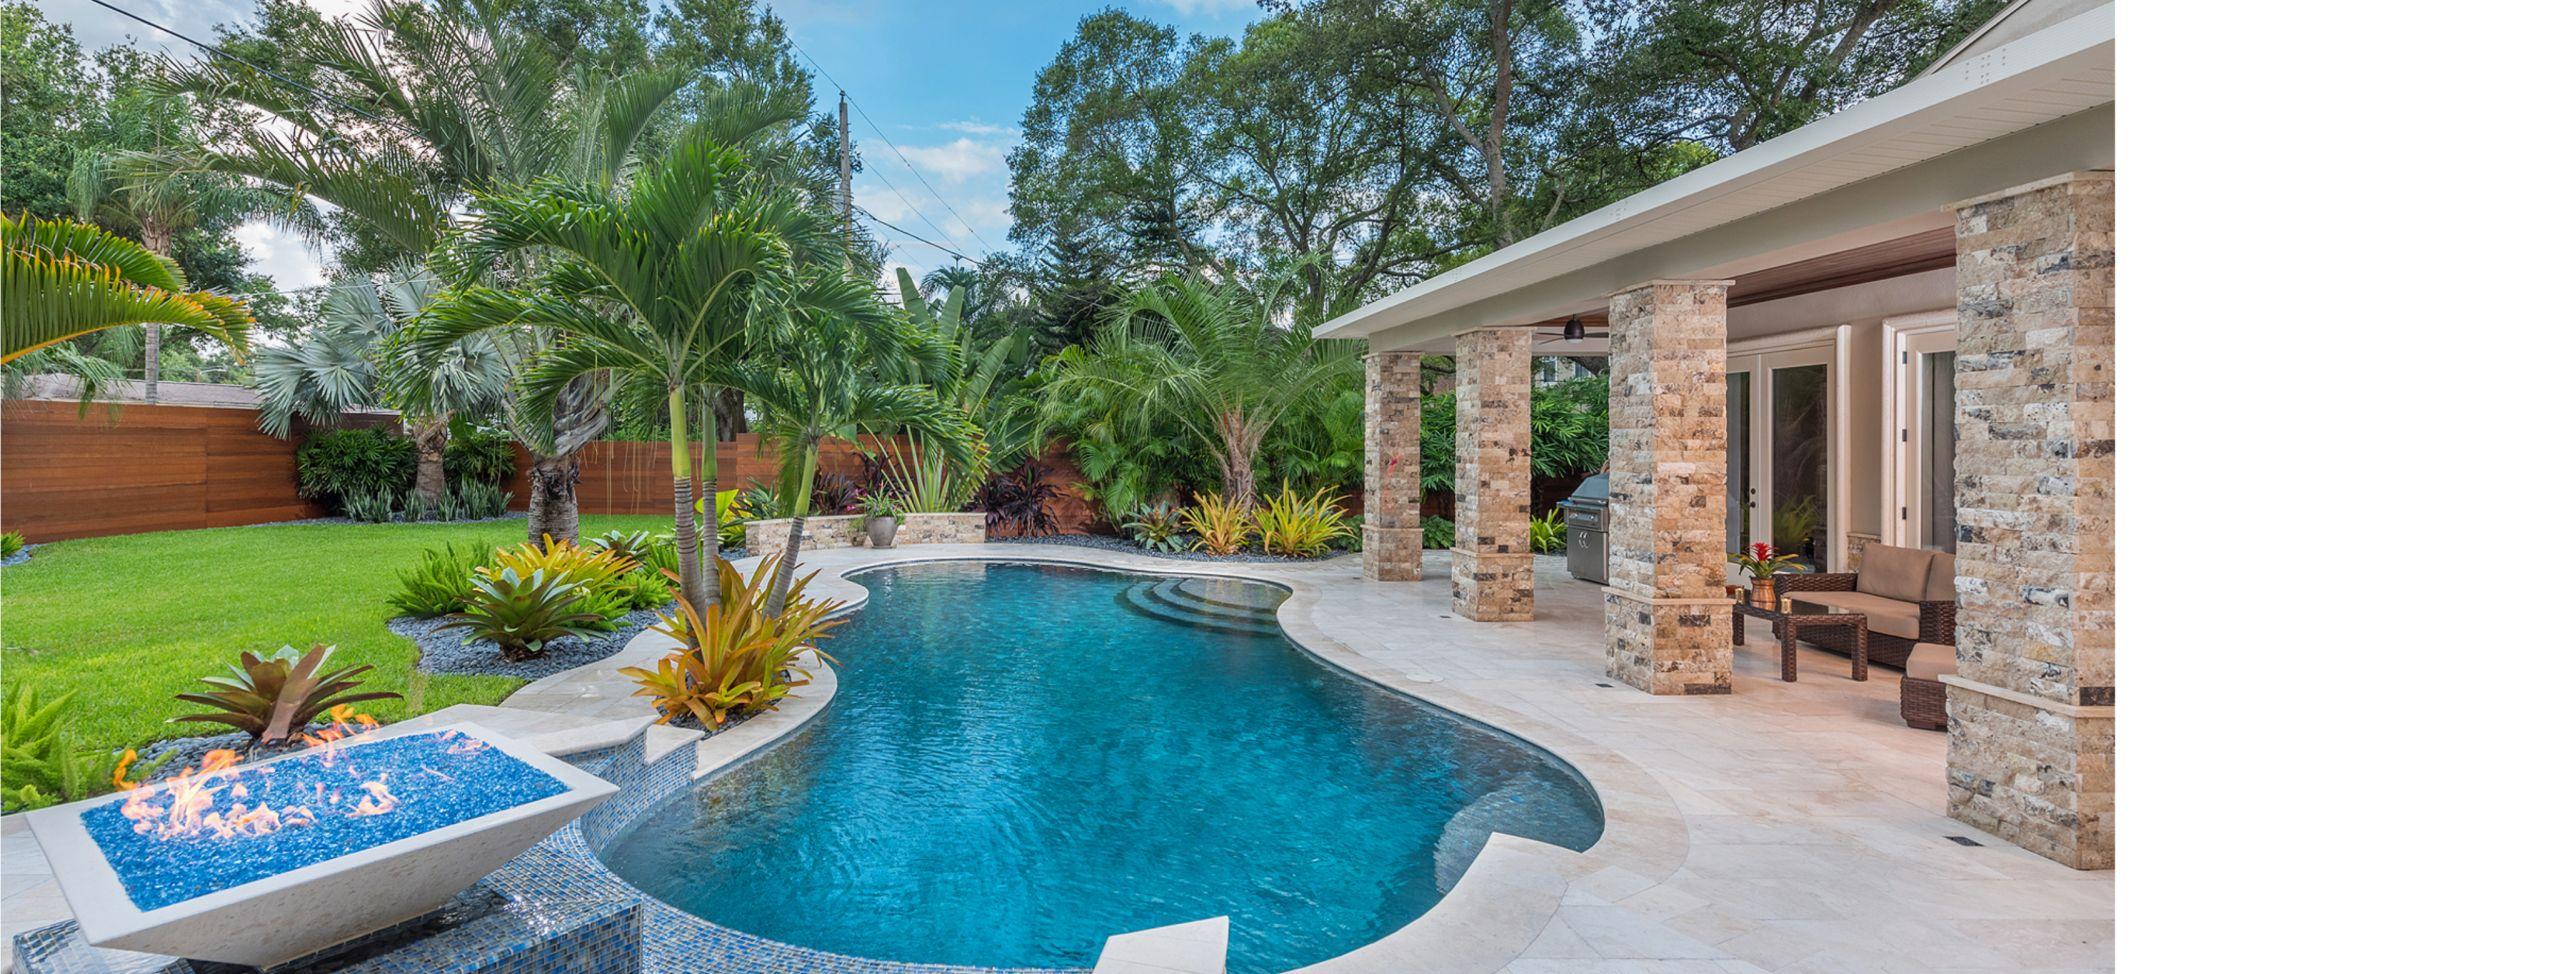 SAN JUAN CAPISTRANO Homes for Sale